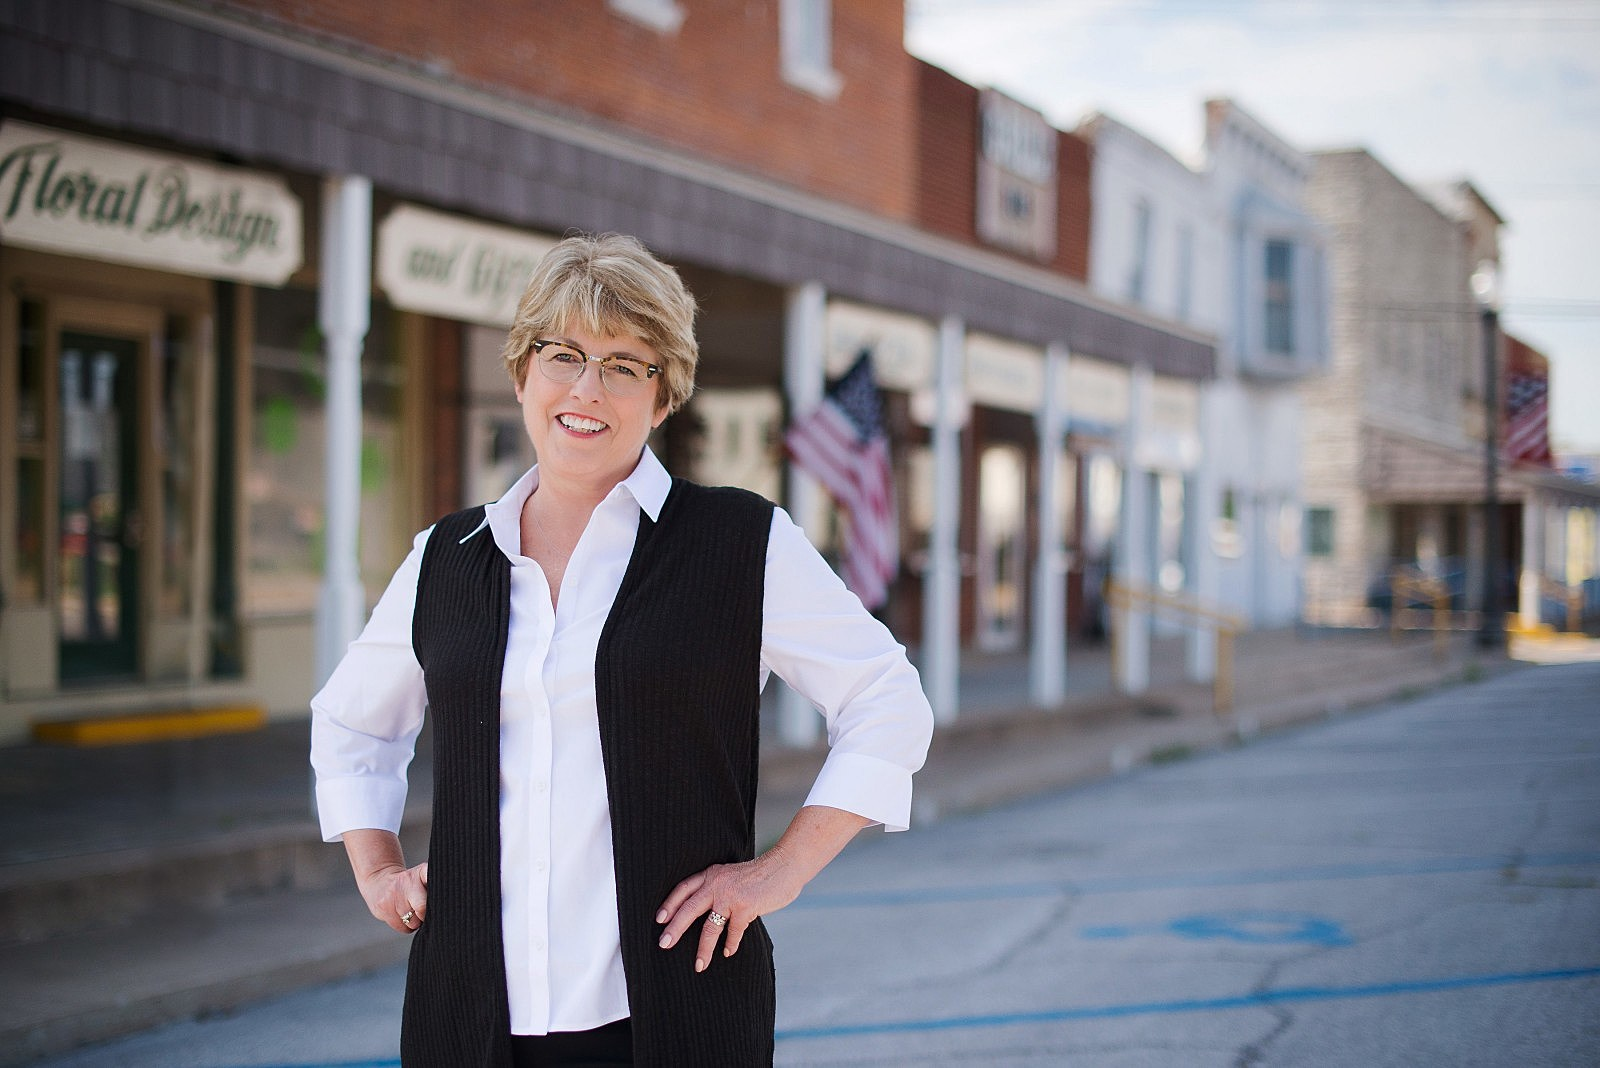 Cindy O'Laughlin/Photo by Emily Dobson